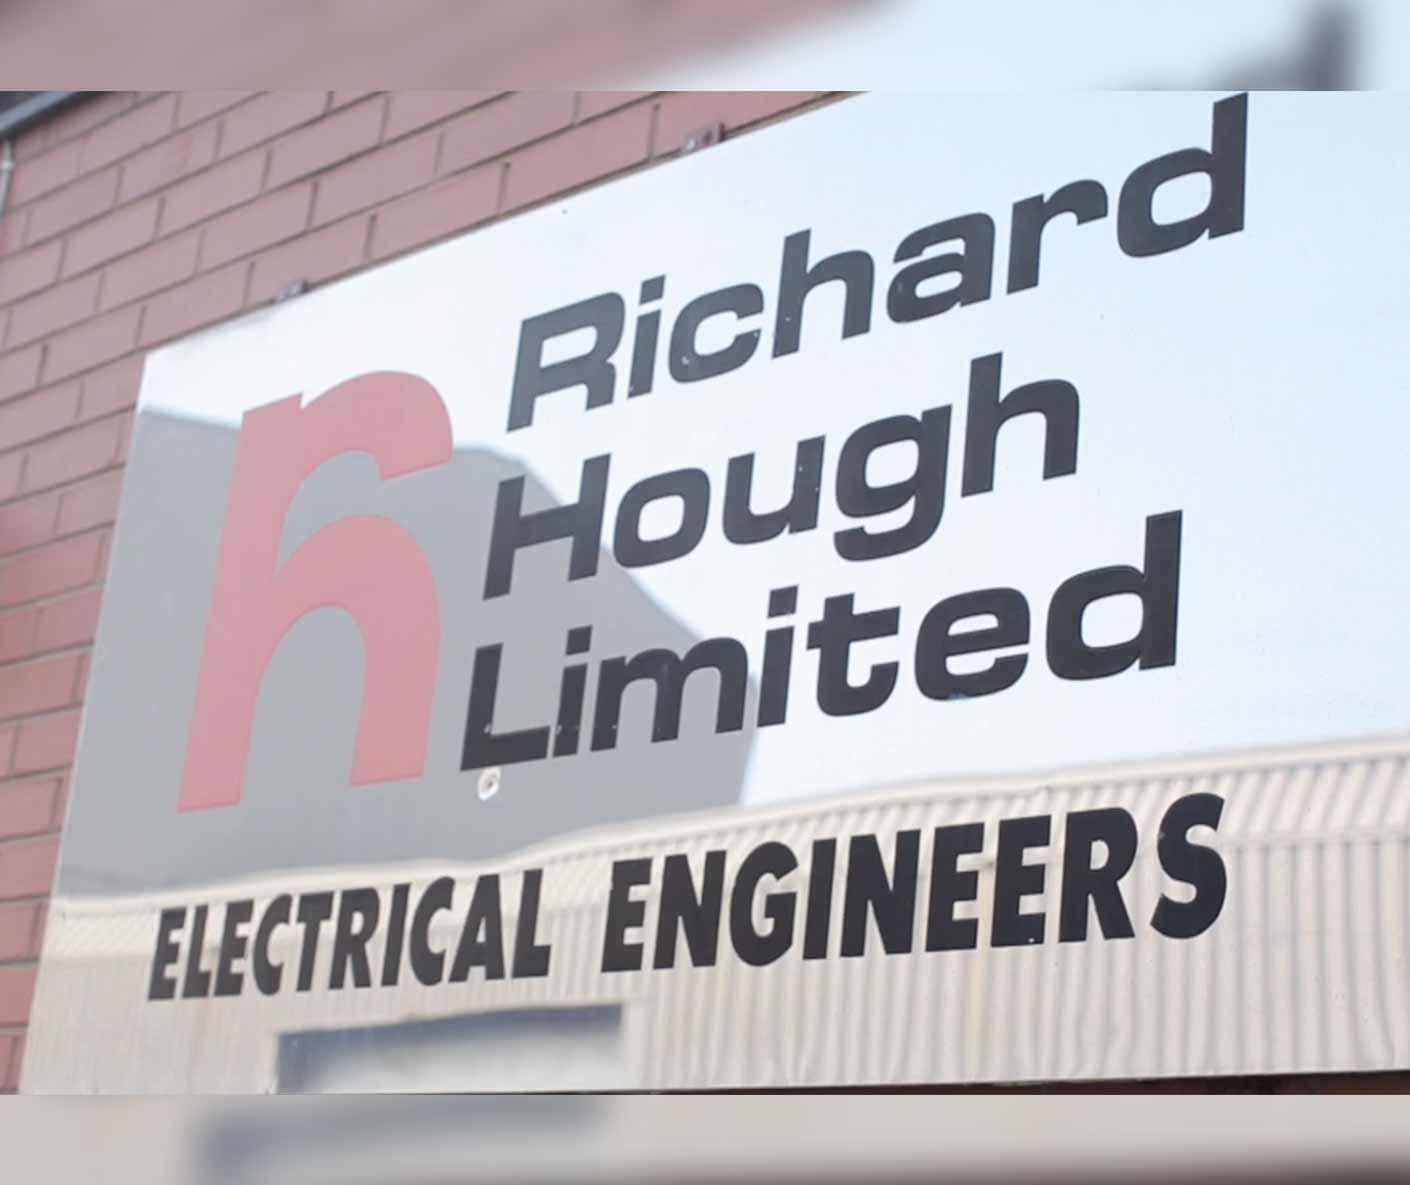 Richard Hough Limited